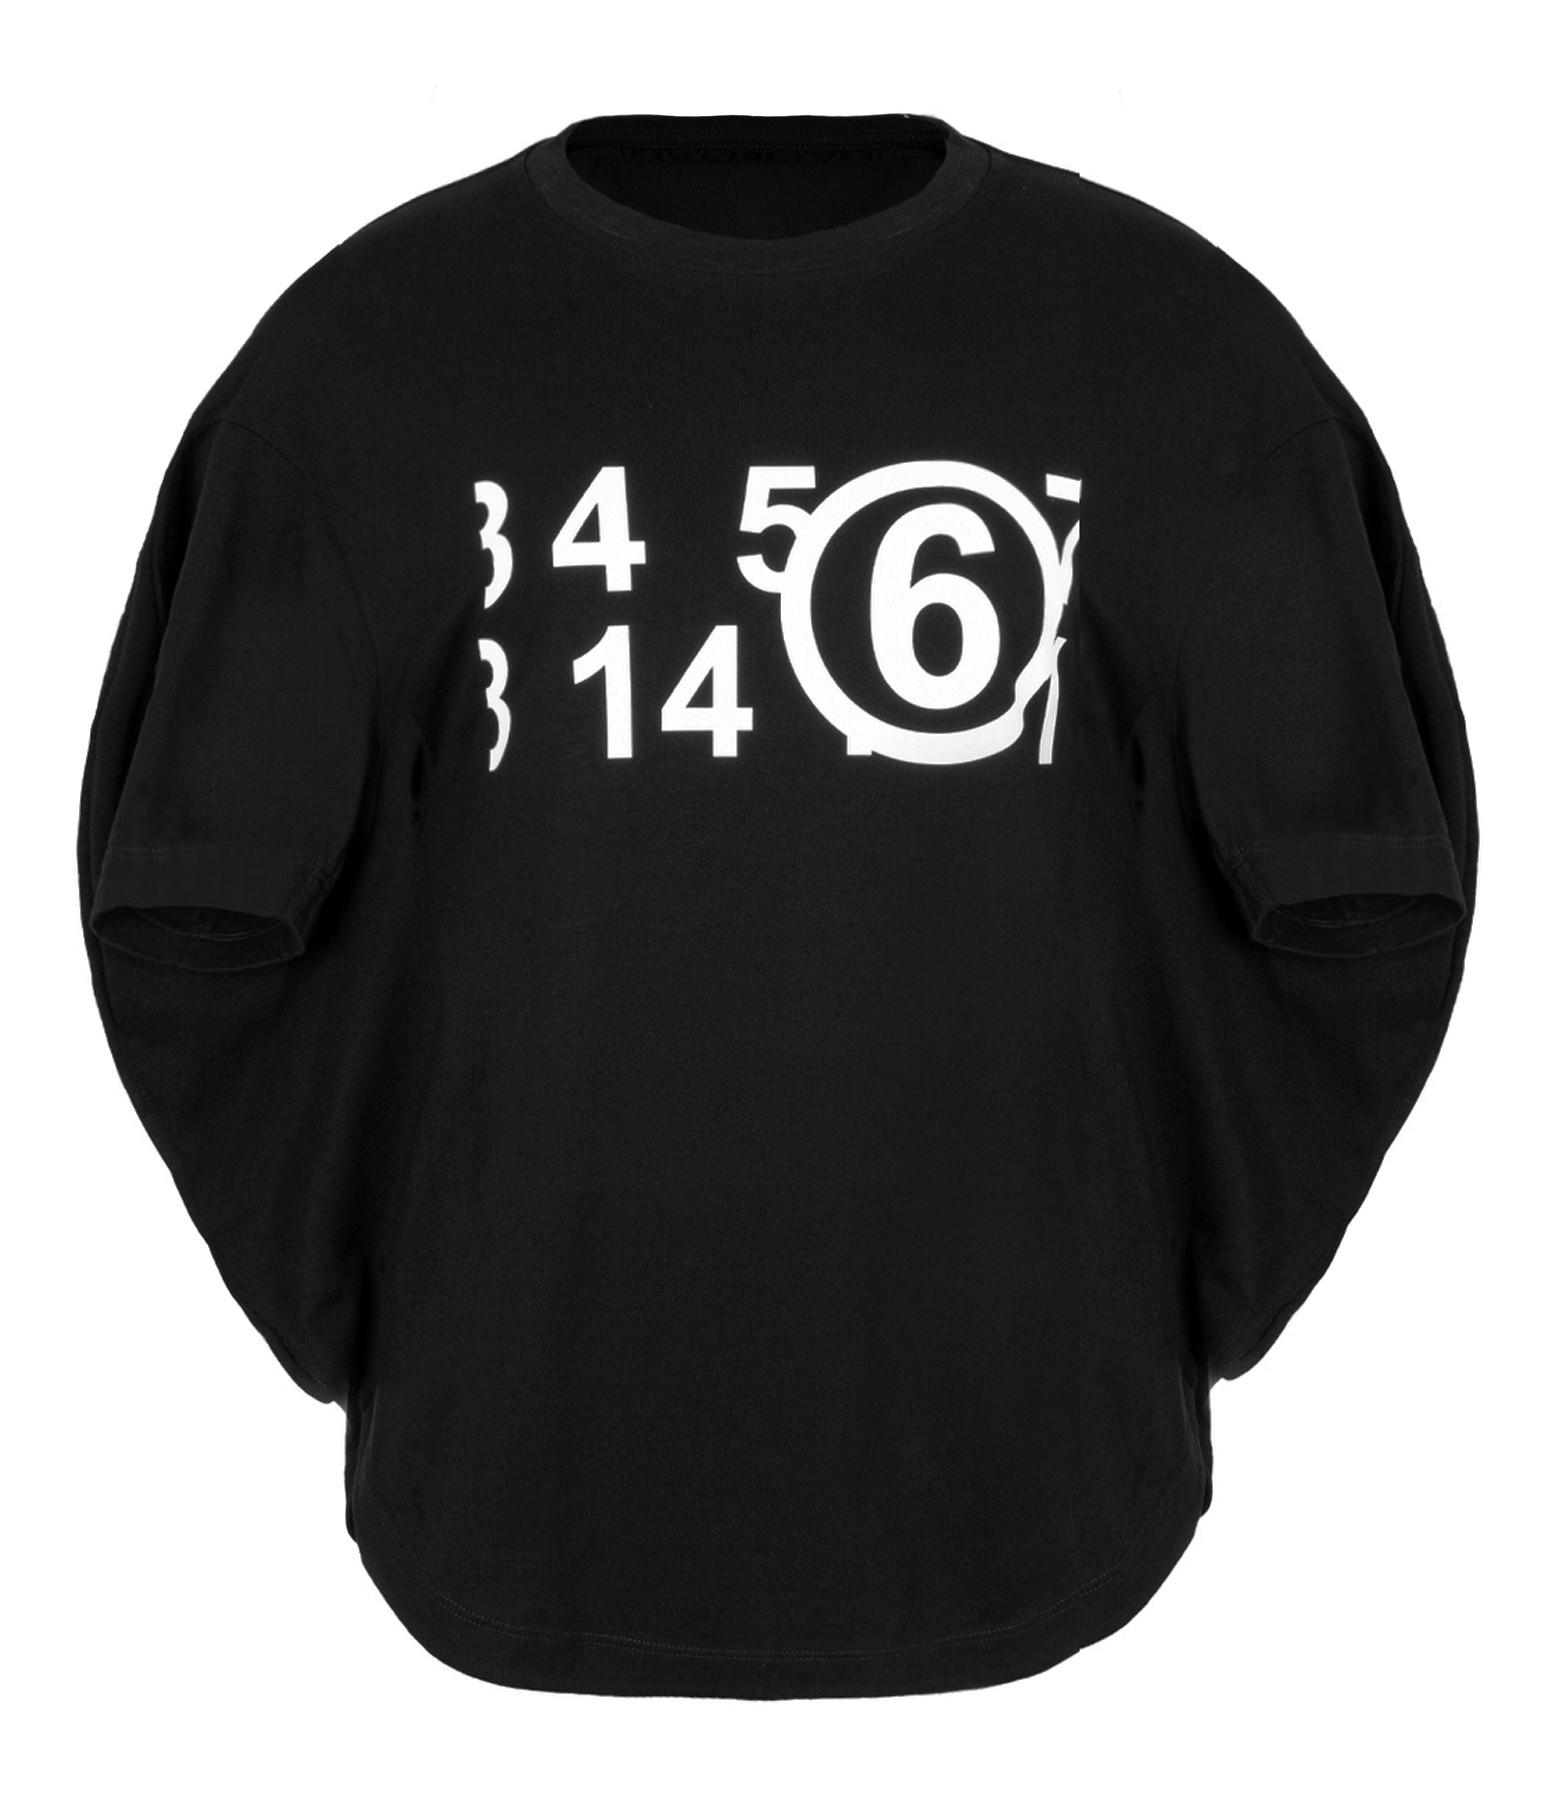 MM6 MAISON MARGIELA - Tee-shirt Noir, Collection Studio